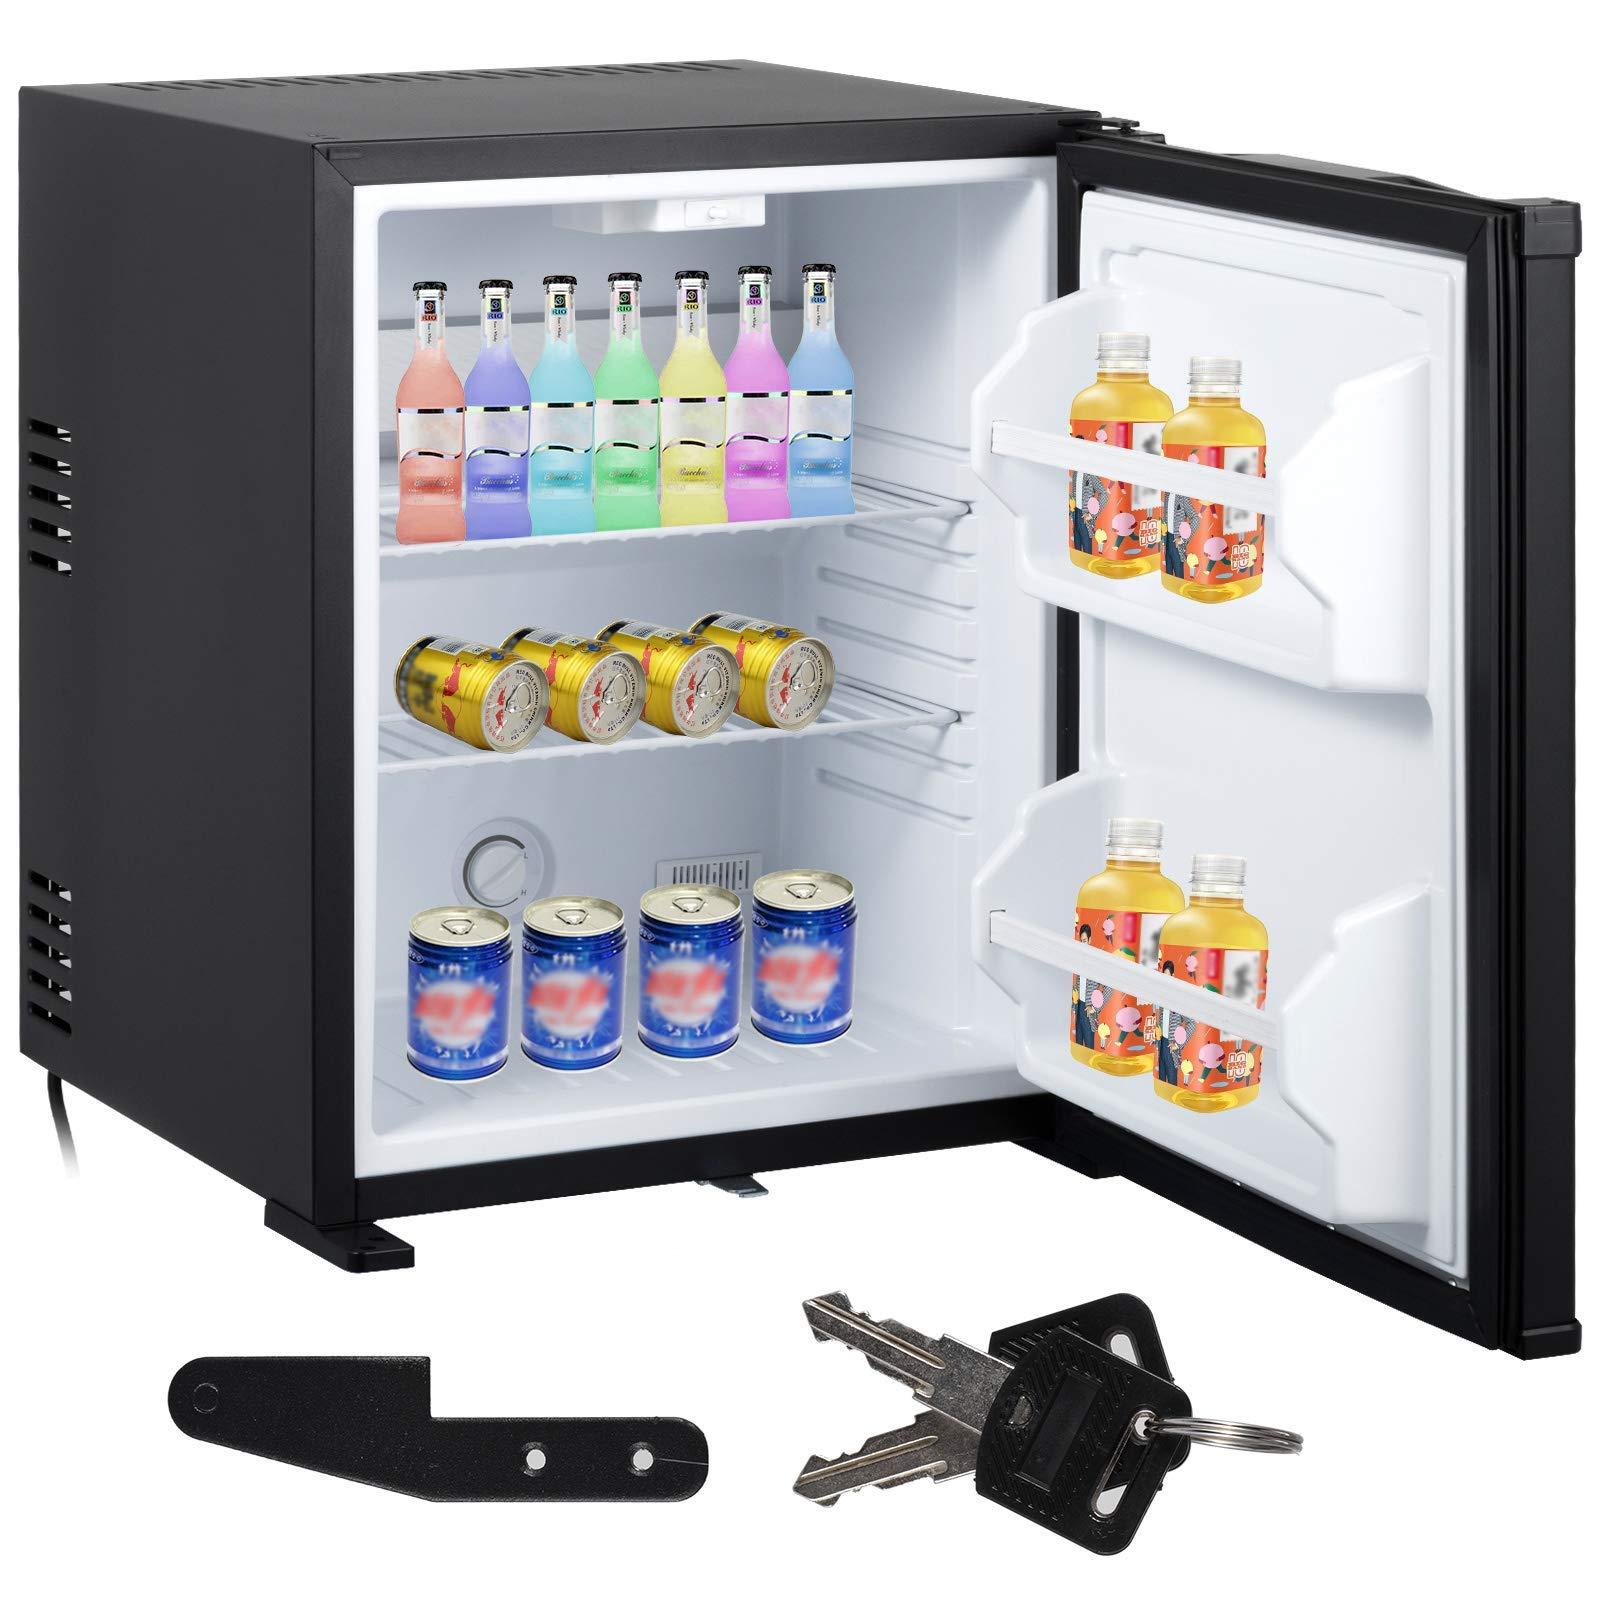 VEVOR Absorption Fridge 1.4 cu.ft 40L Compact Refrigerator Silent Mini Cooler Black with Lock Reversible Door For Hotel Bar Car Vehicle Apartment Camping